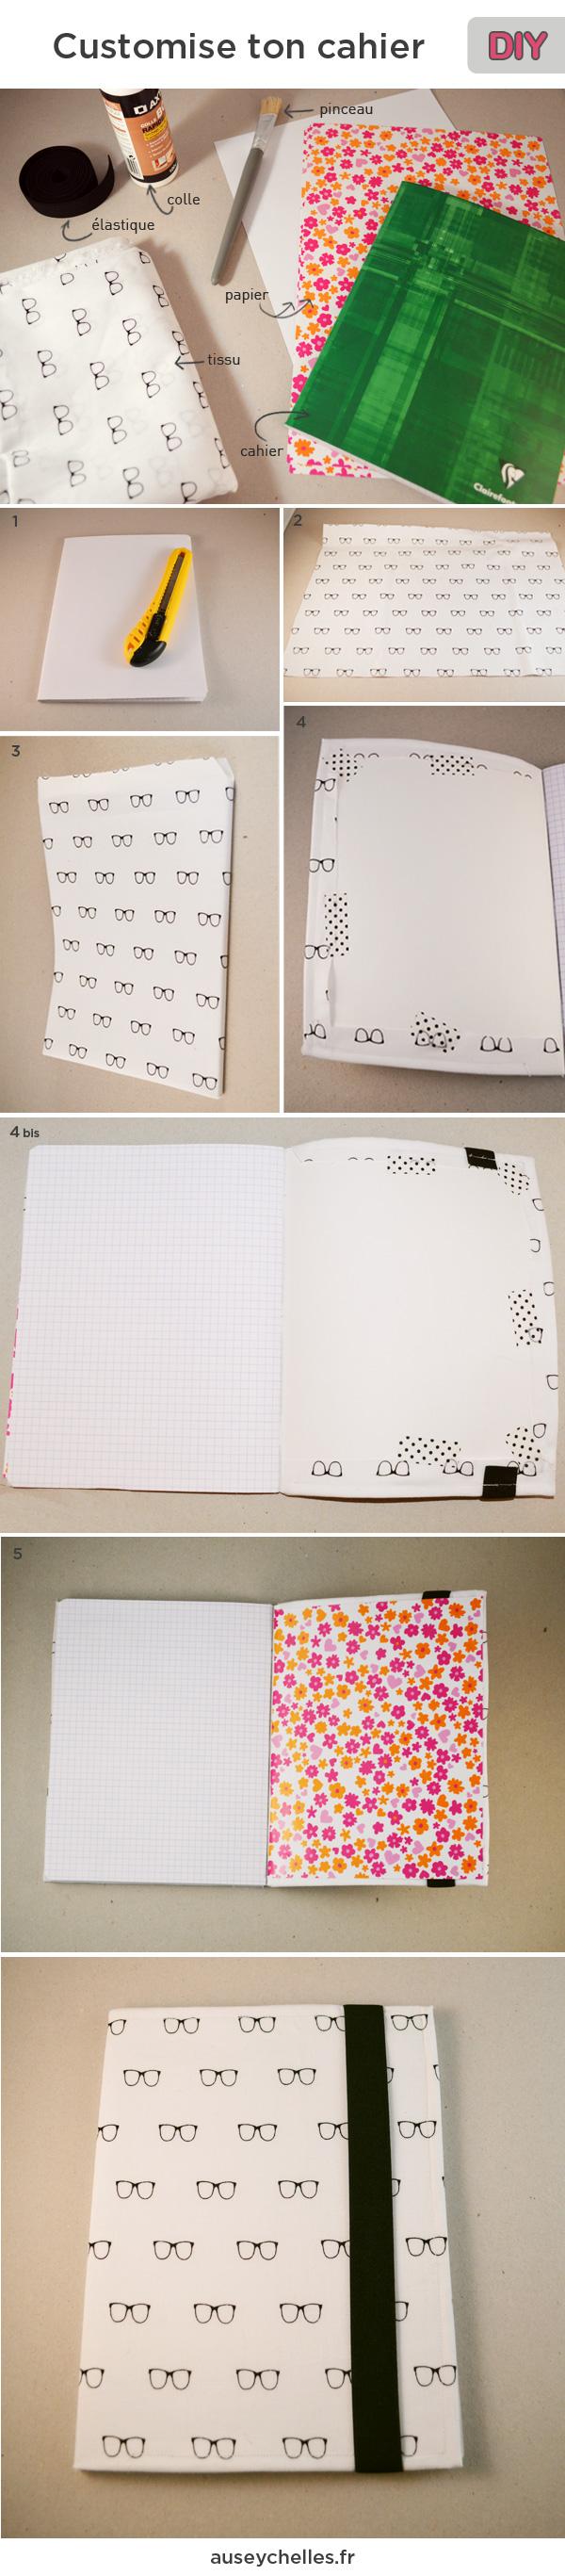 tutoriel DIY customisation cahier